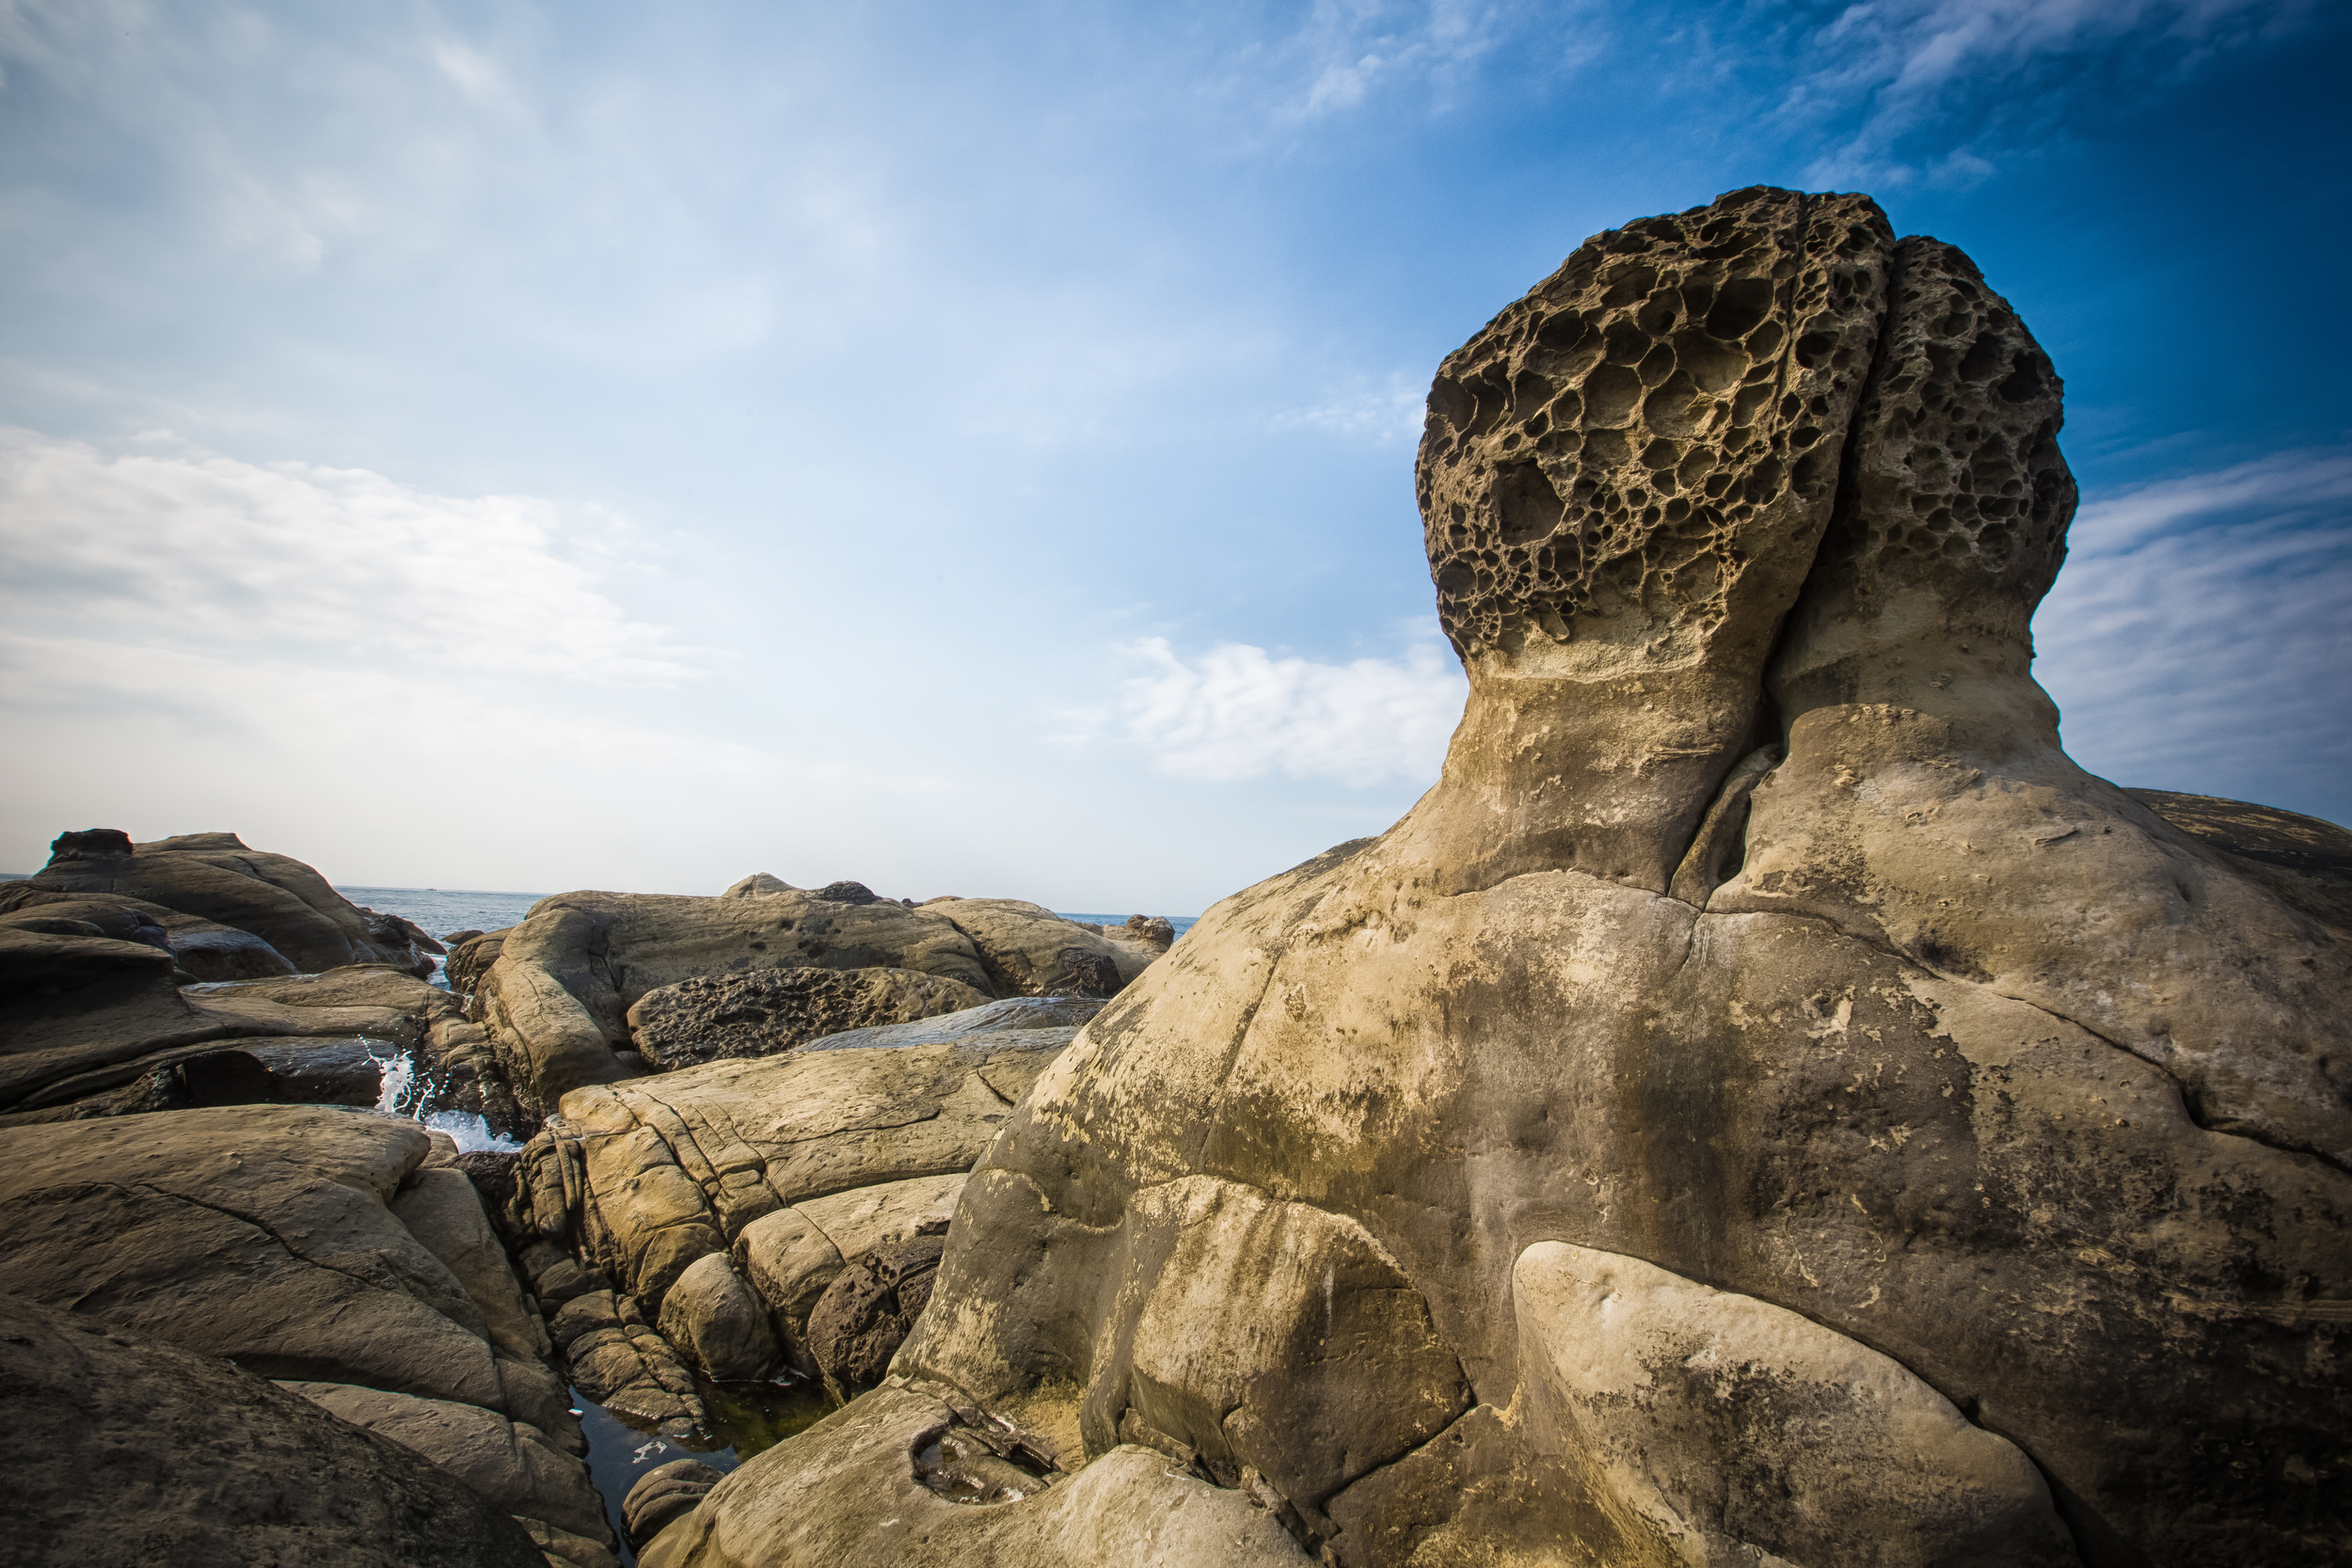 A Mushroom rock.